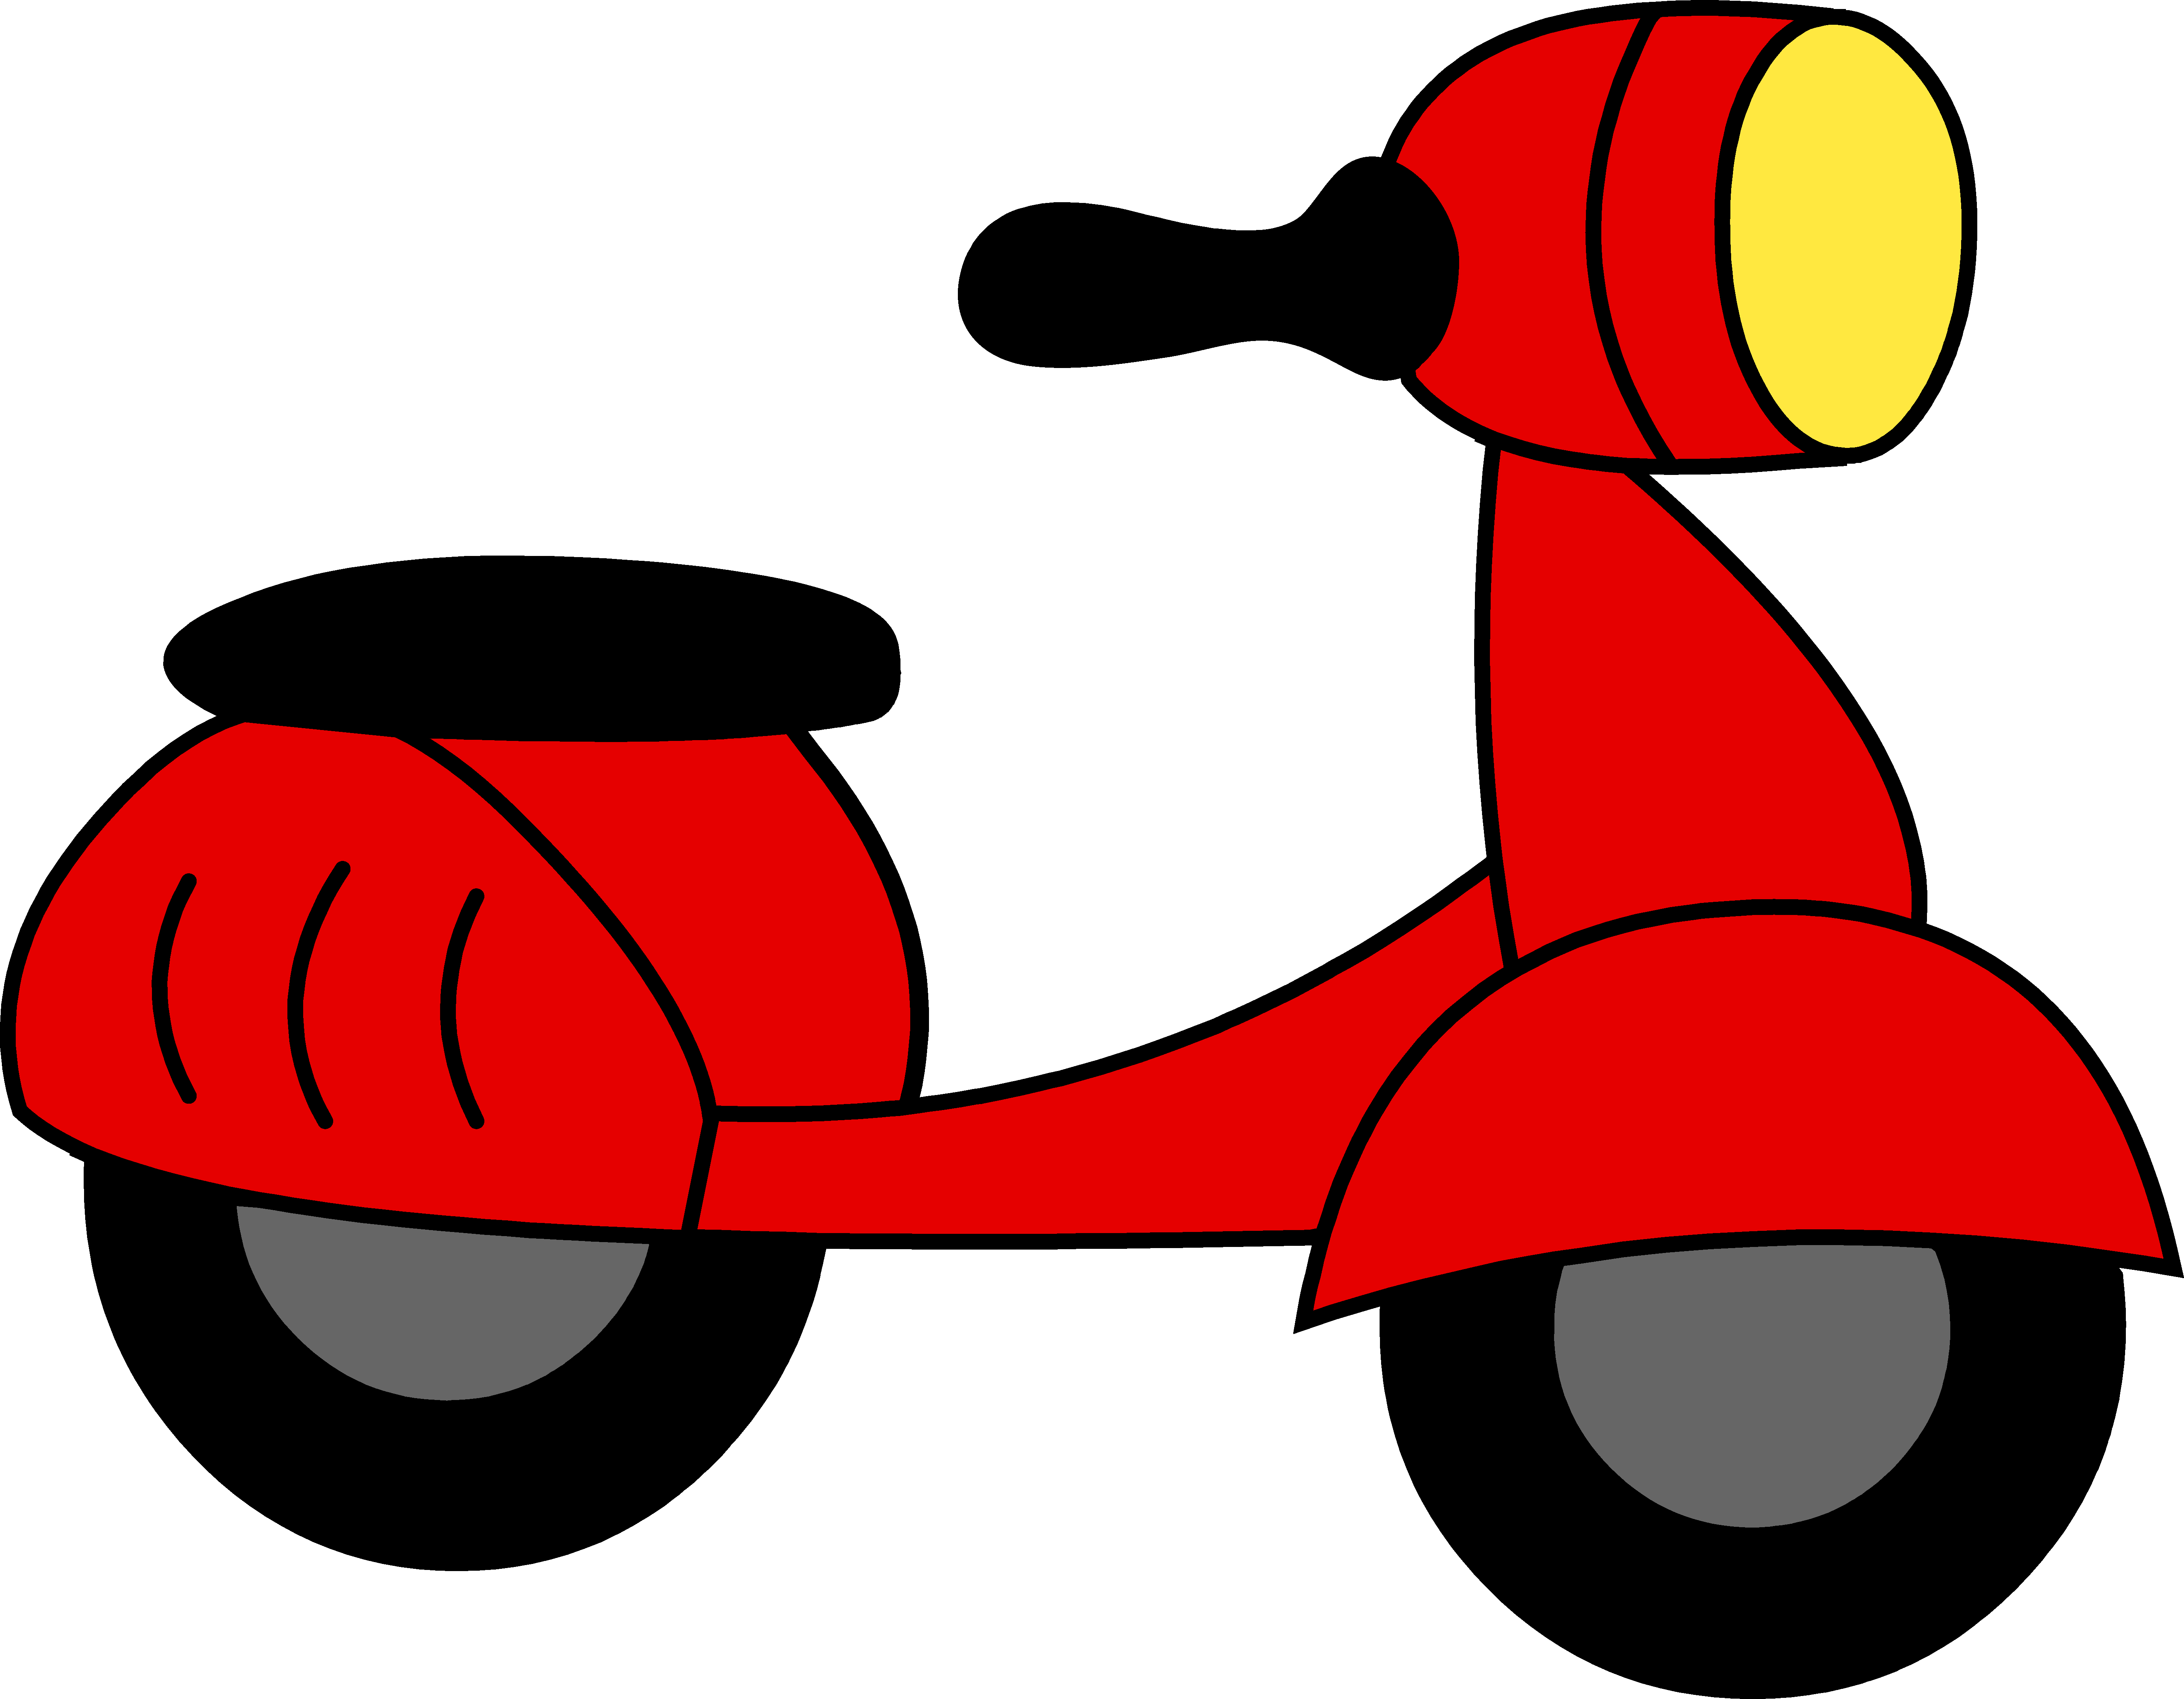 Motor clipart #17, Download drawings